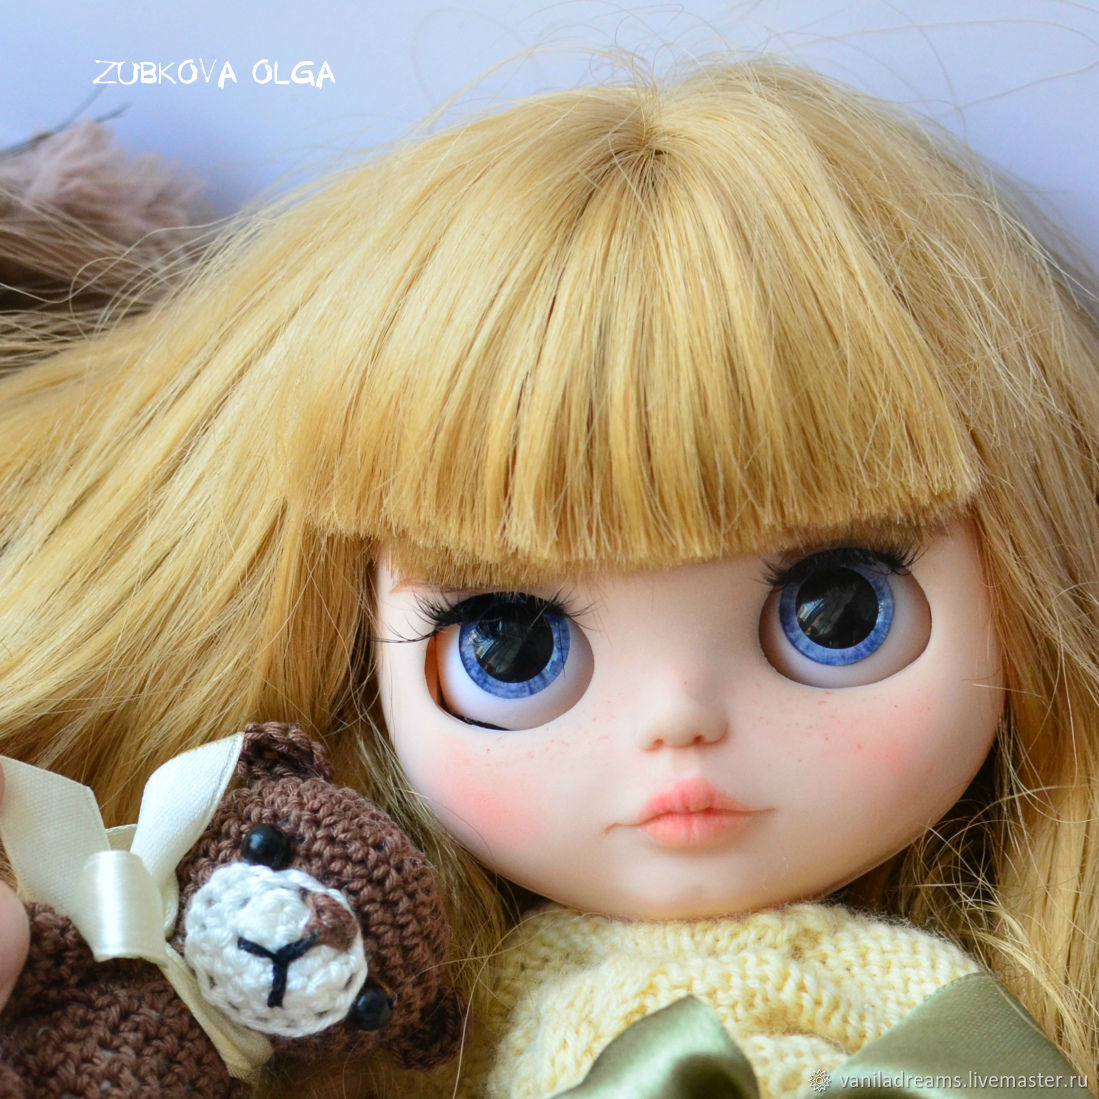 блайз.кастом блайз ооак блайз кукла блайз зубкова ольга купить блайз © https://www.livemaster.ru/item/edit/26612523